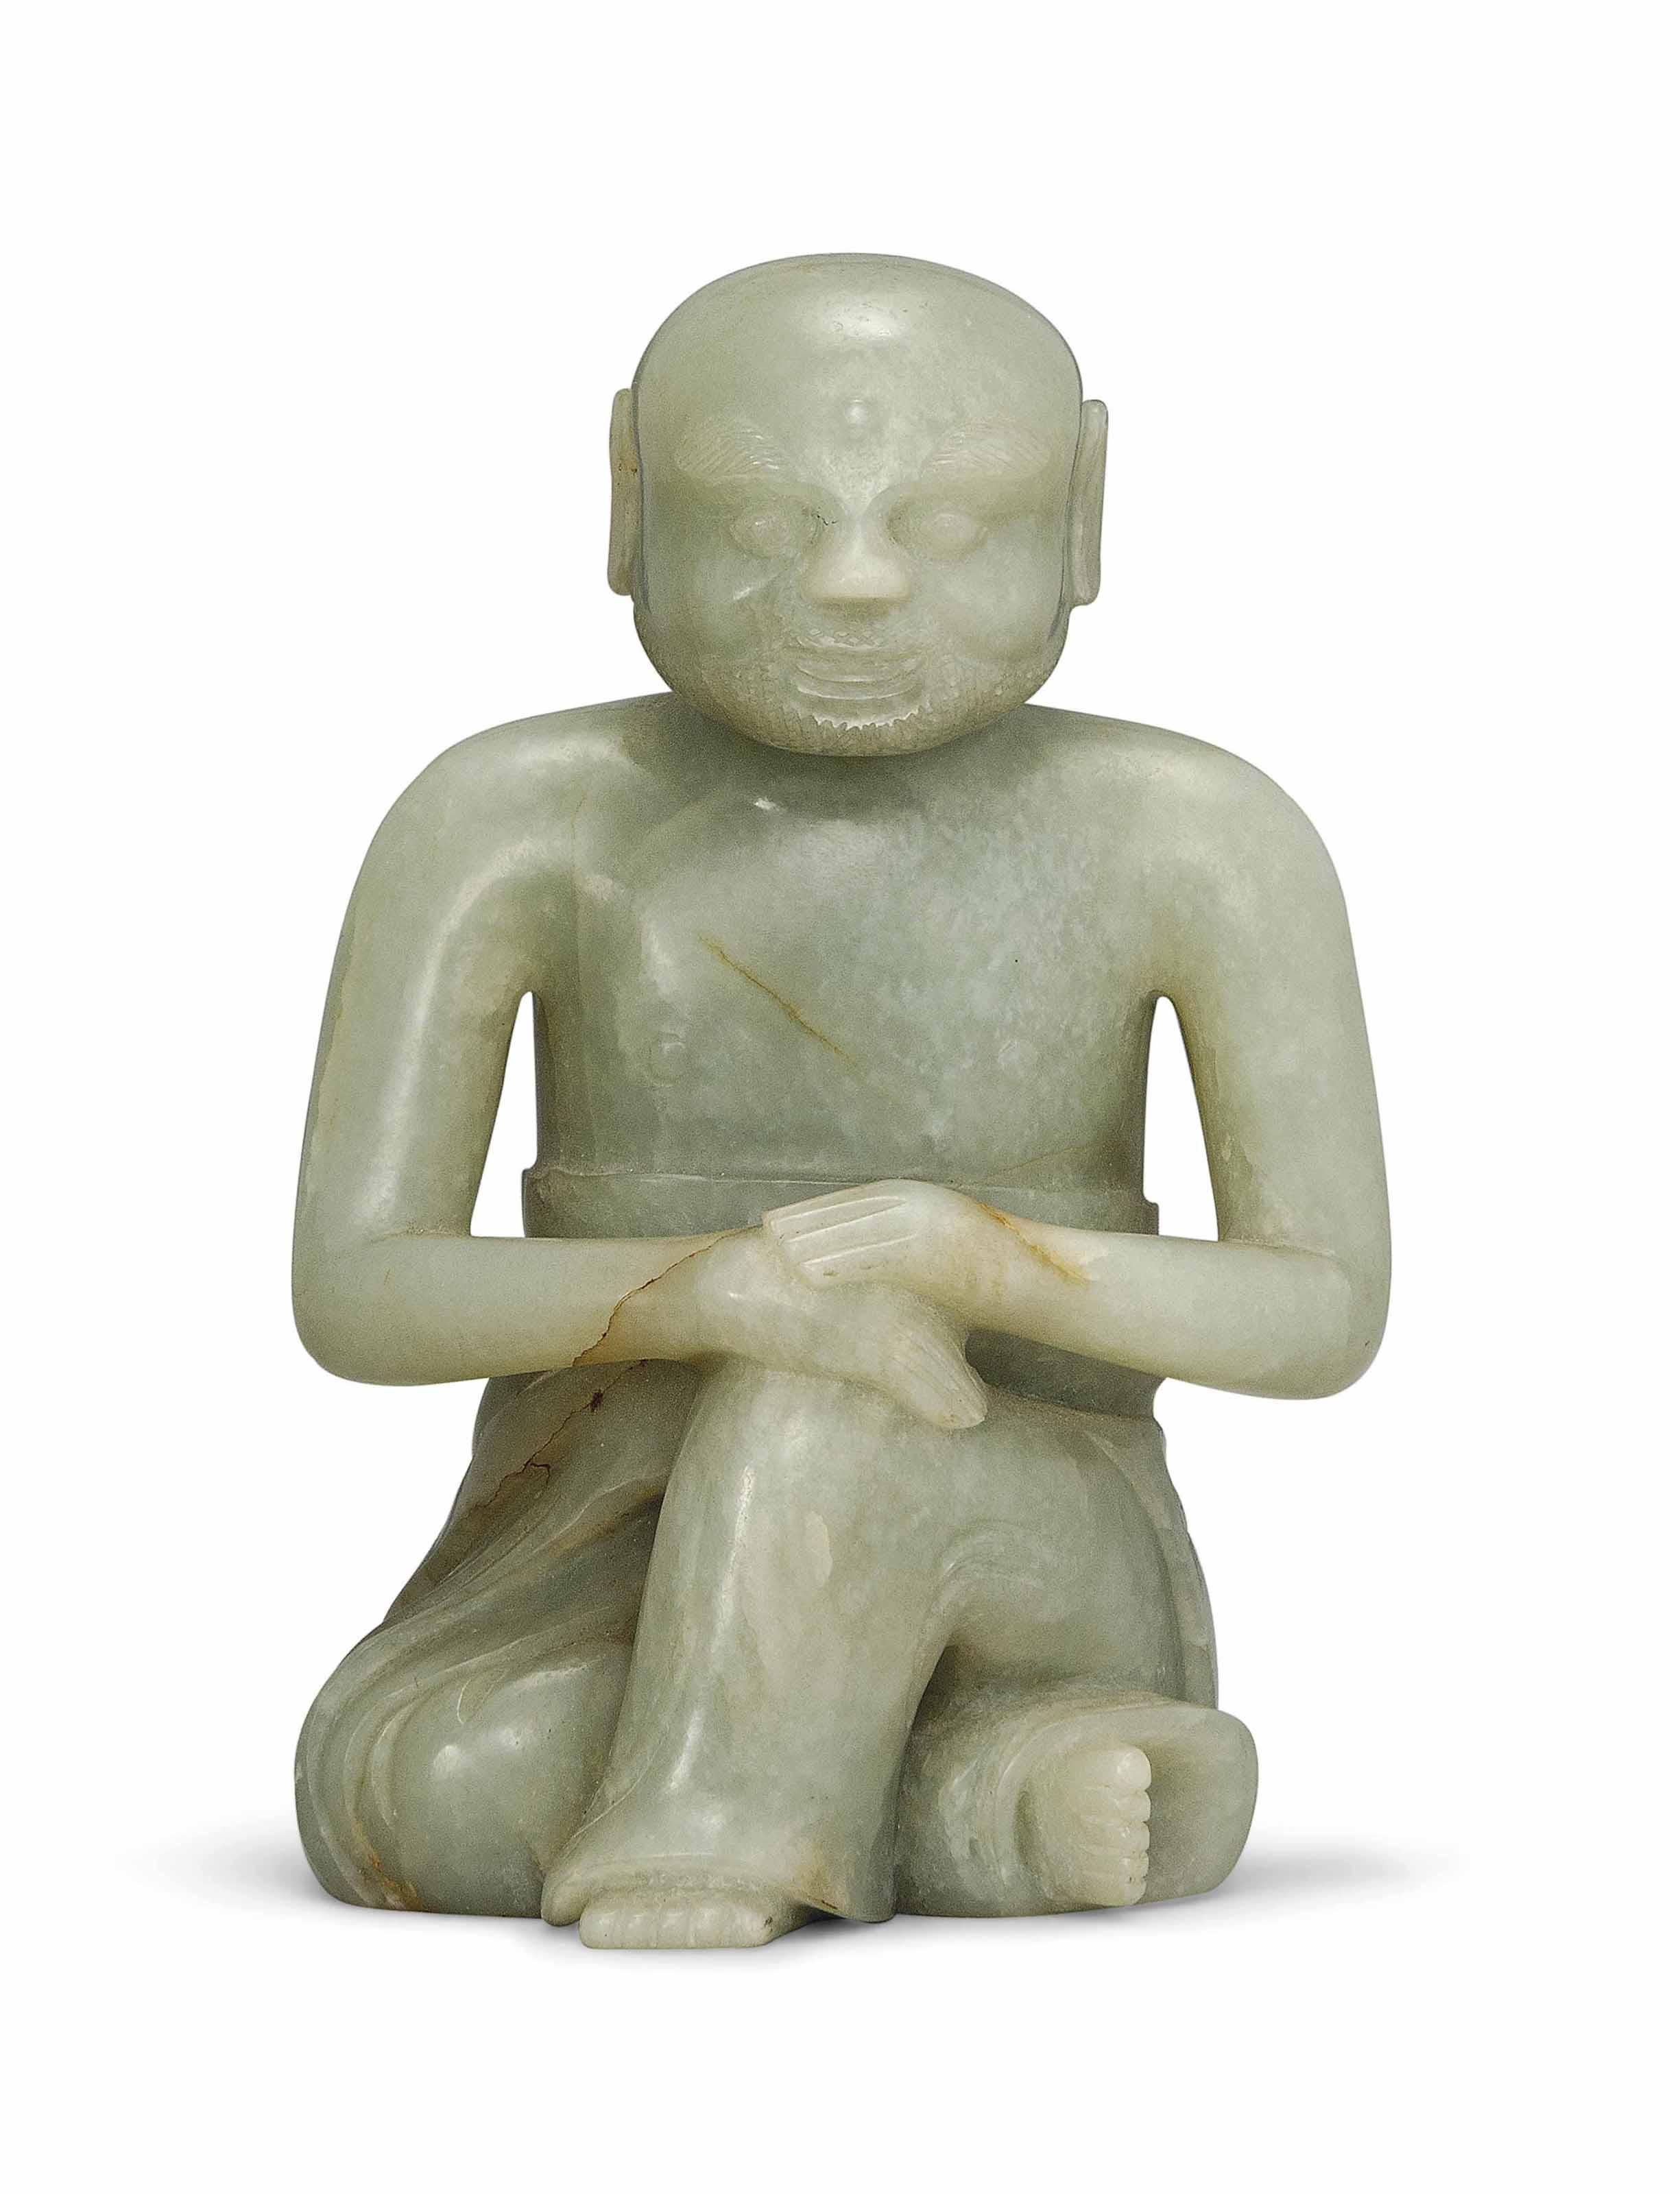 A CELADON JADE BUDDHIST FIGURE